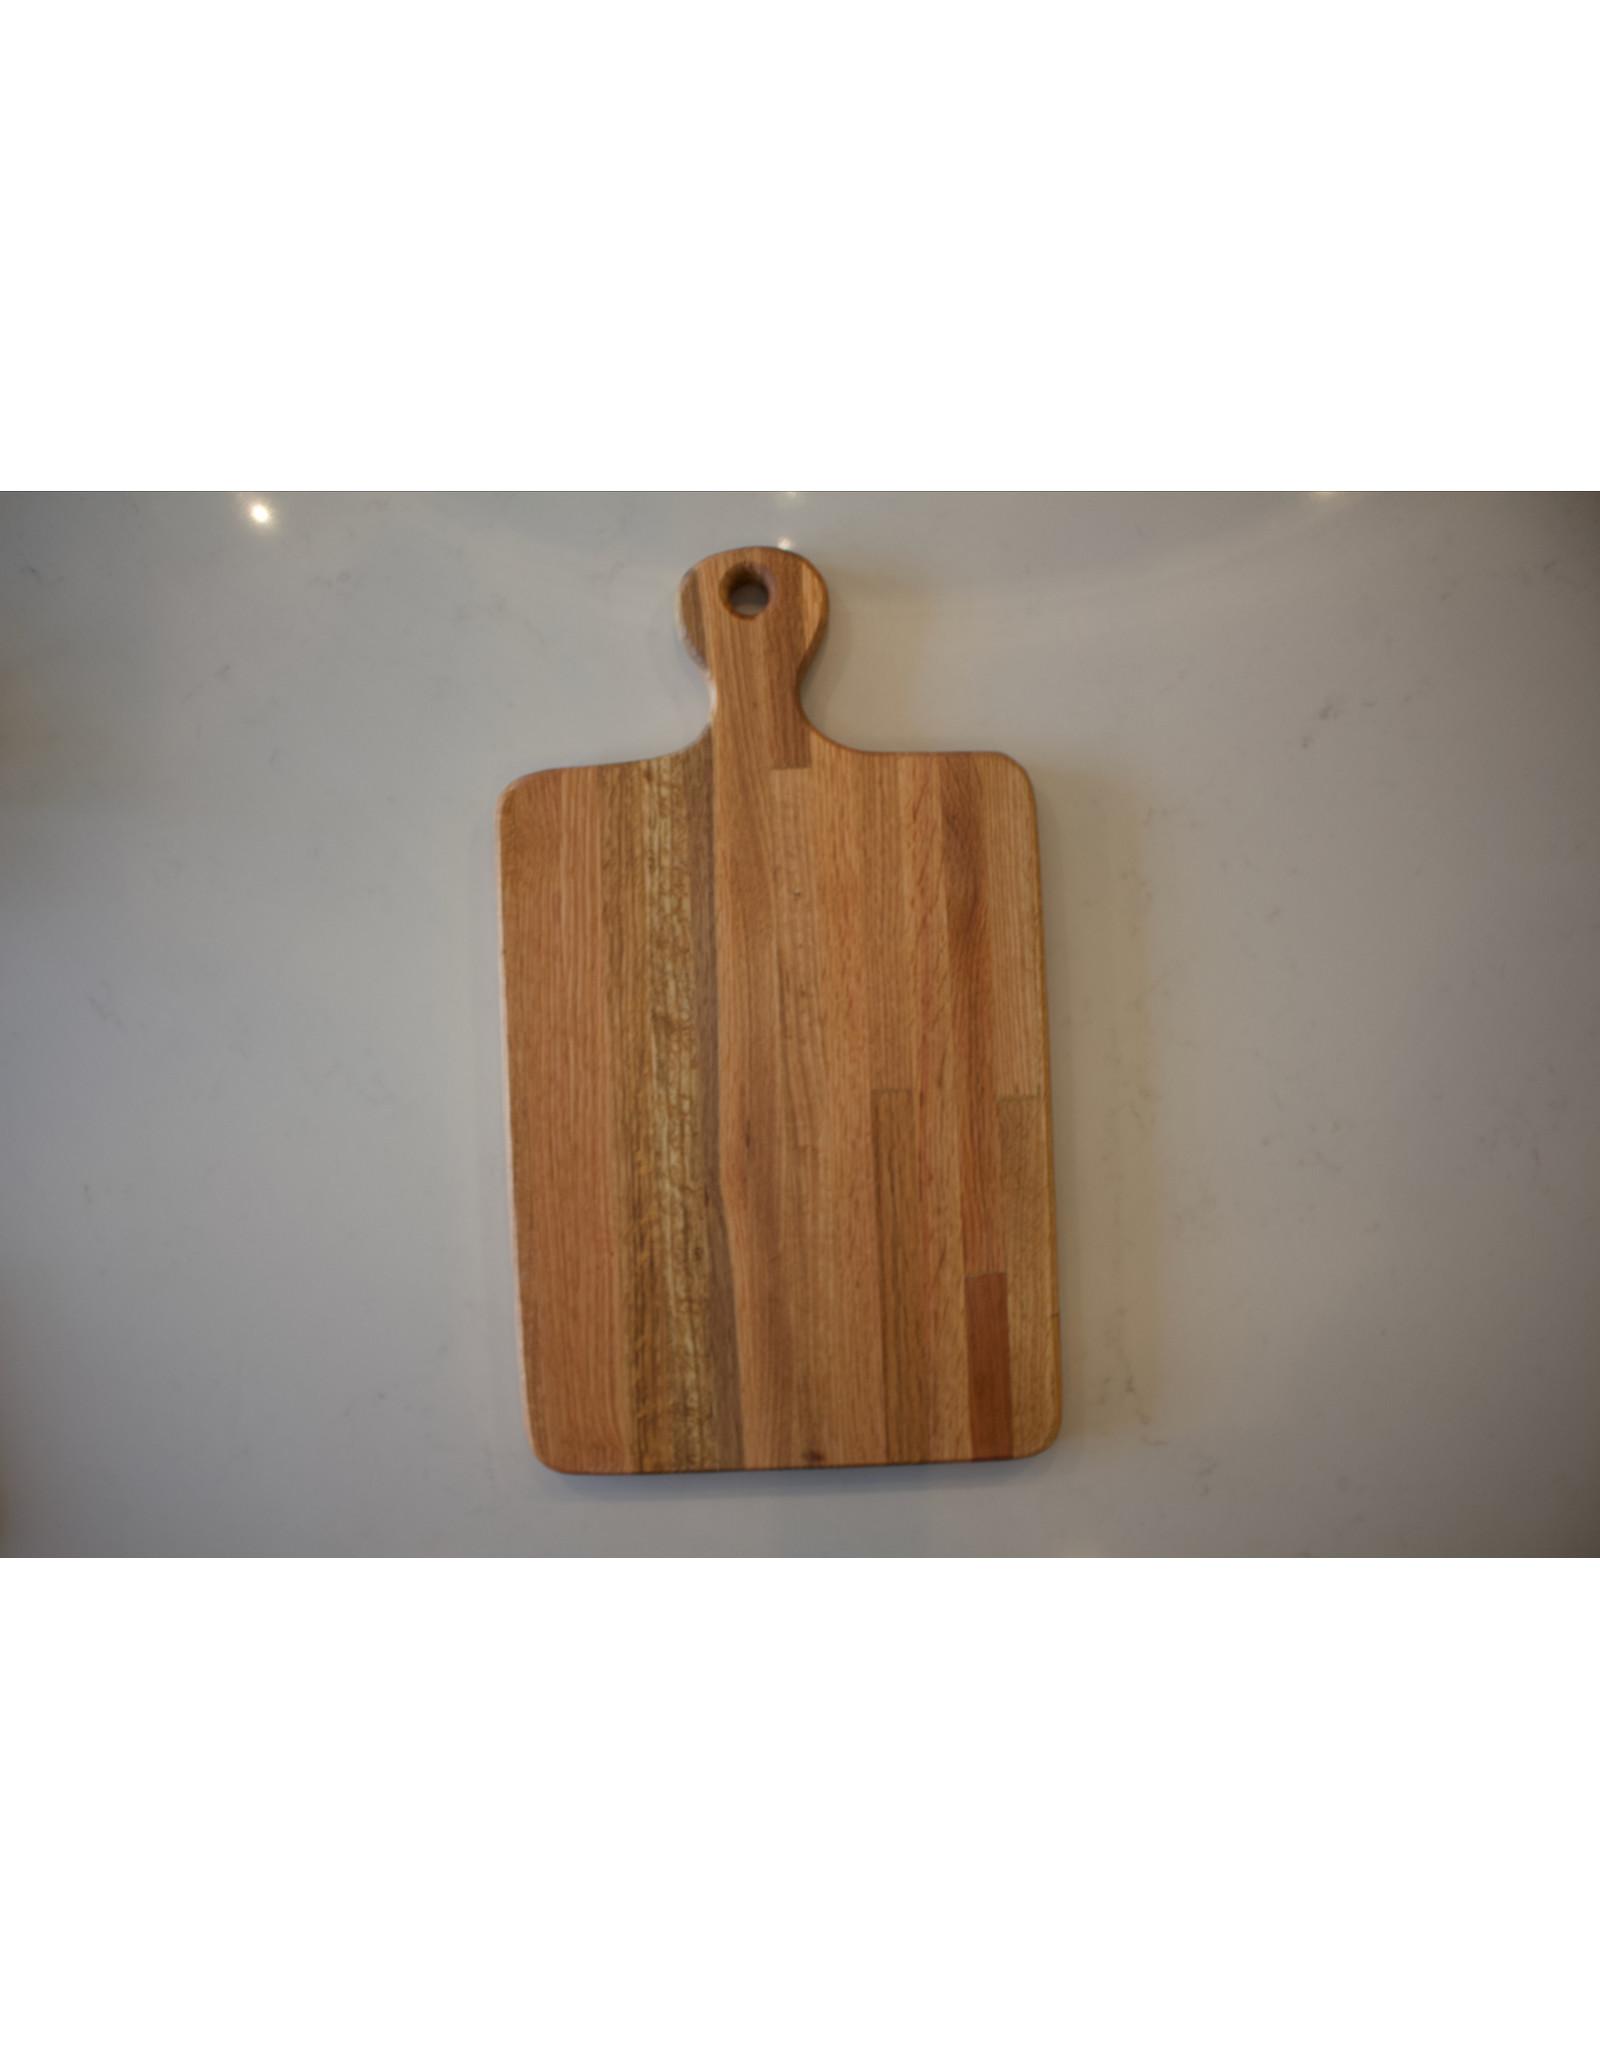 Gypsy Wagon Large Rectangle Paddle Board